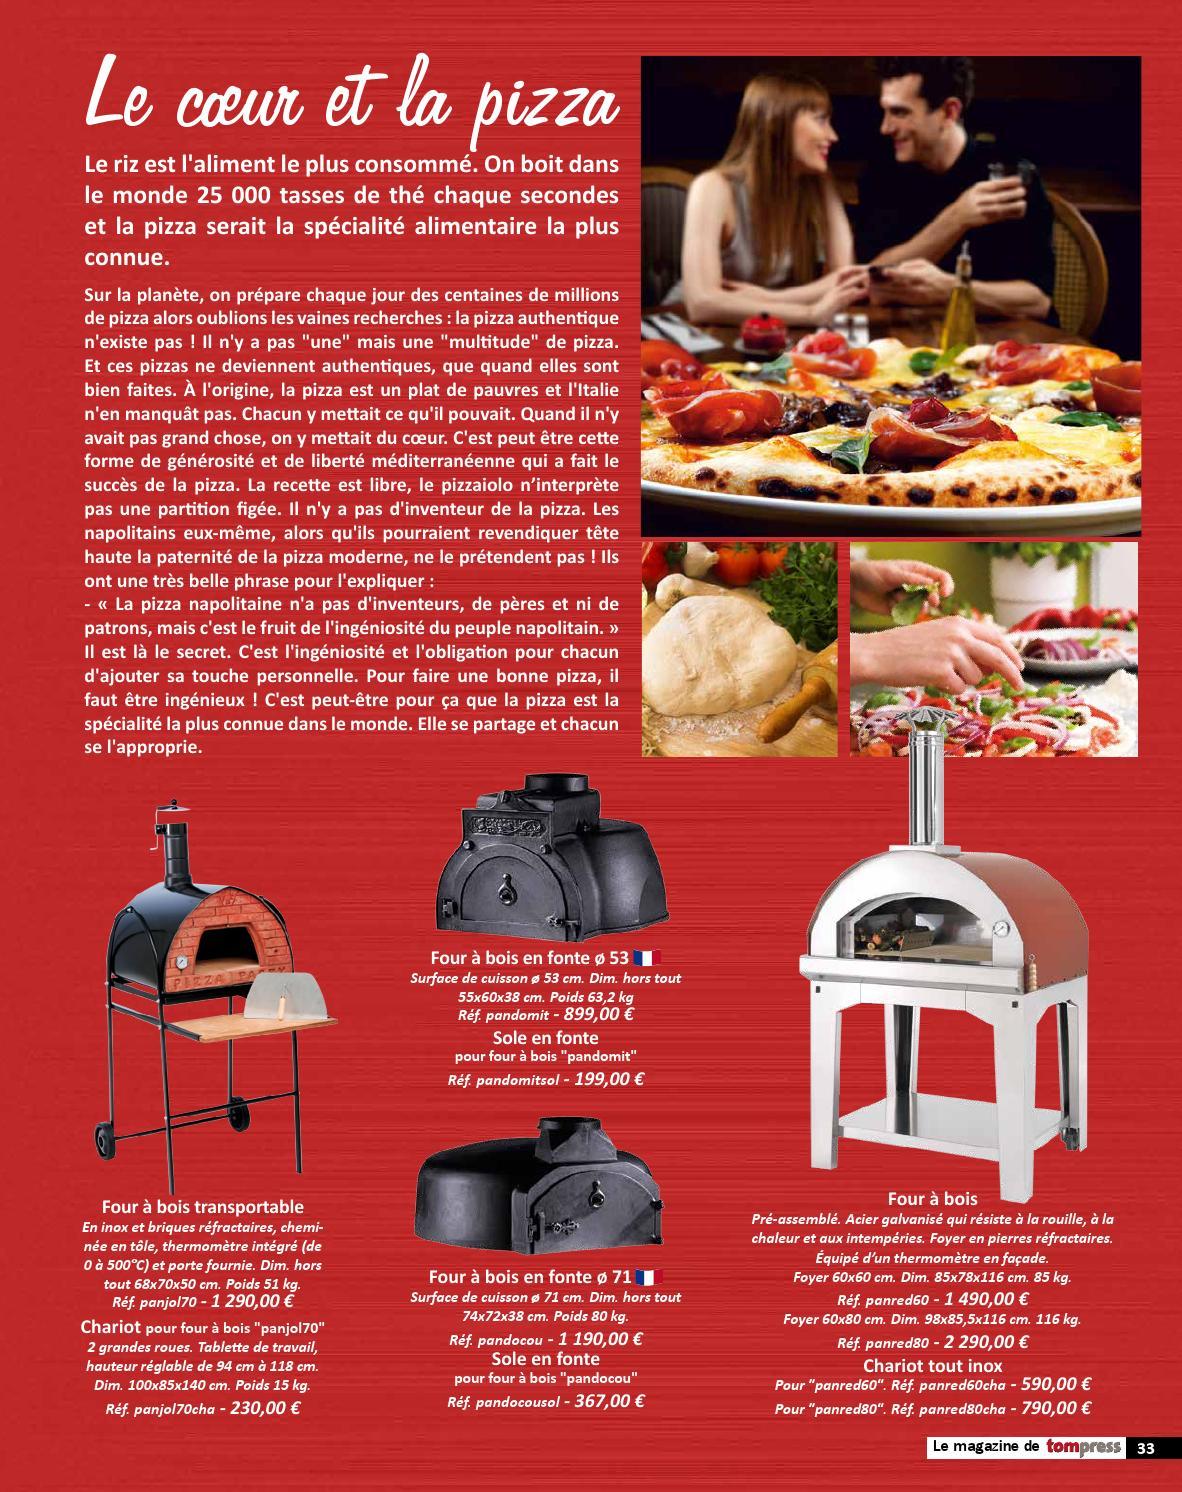 Thermomètre Four À Pain 500 spécial charcuterie 2014 par tom presstom press - issuu